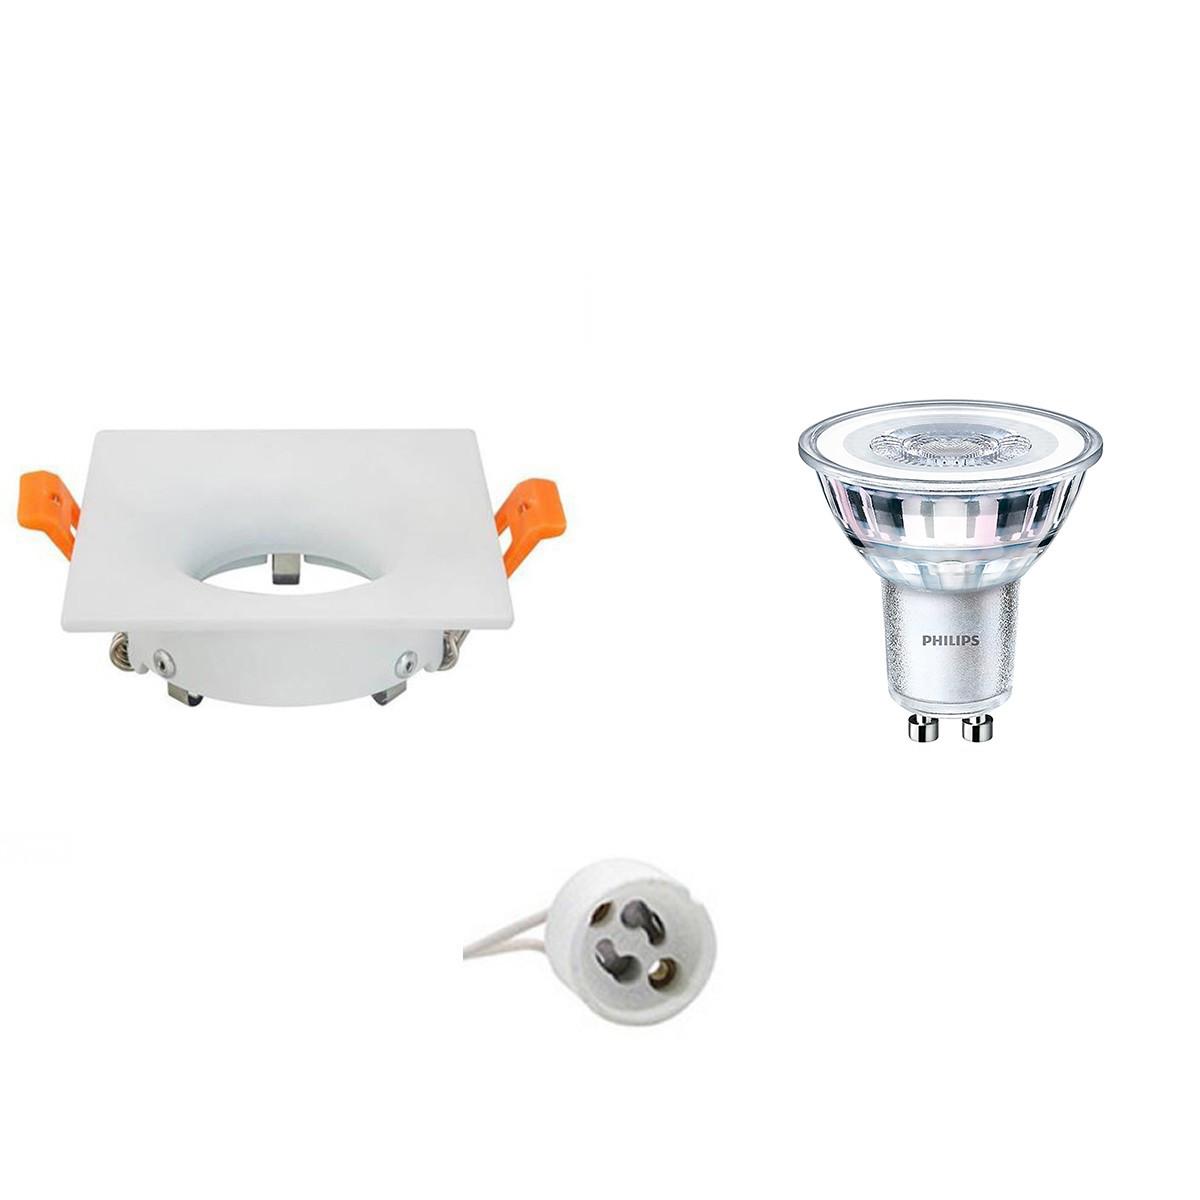 PHILIPS - LED Spot Set - CorePro 830 36D - GU10 Fitting - Dimbaar - Inbouw Vierkant - Mat Wit - 5W -